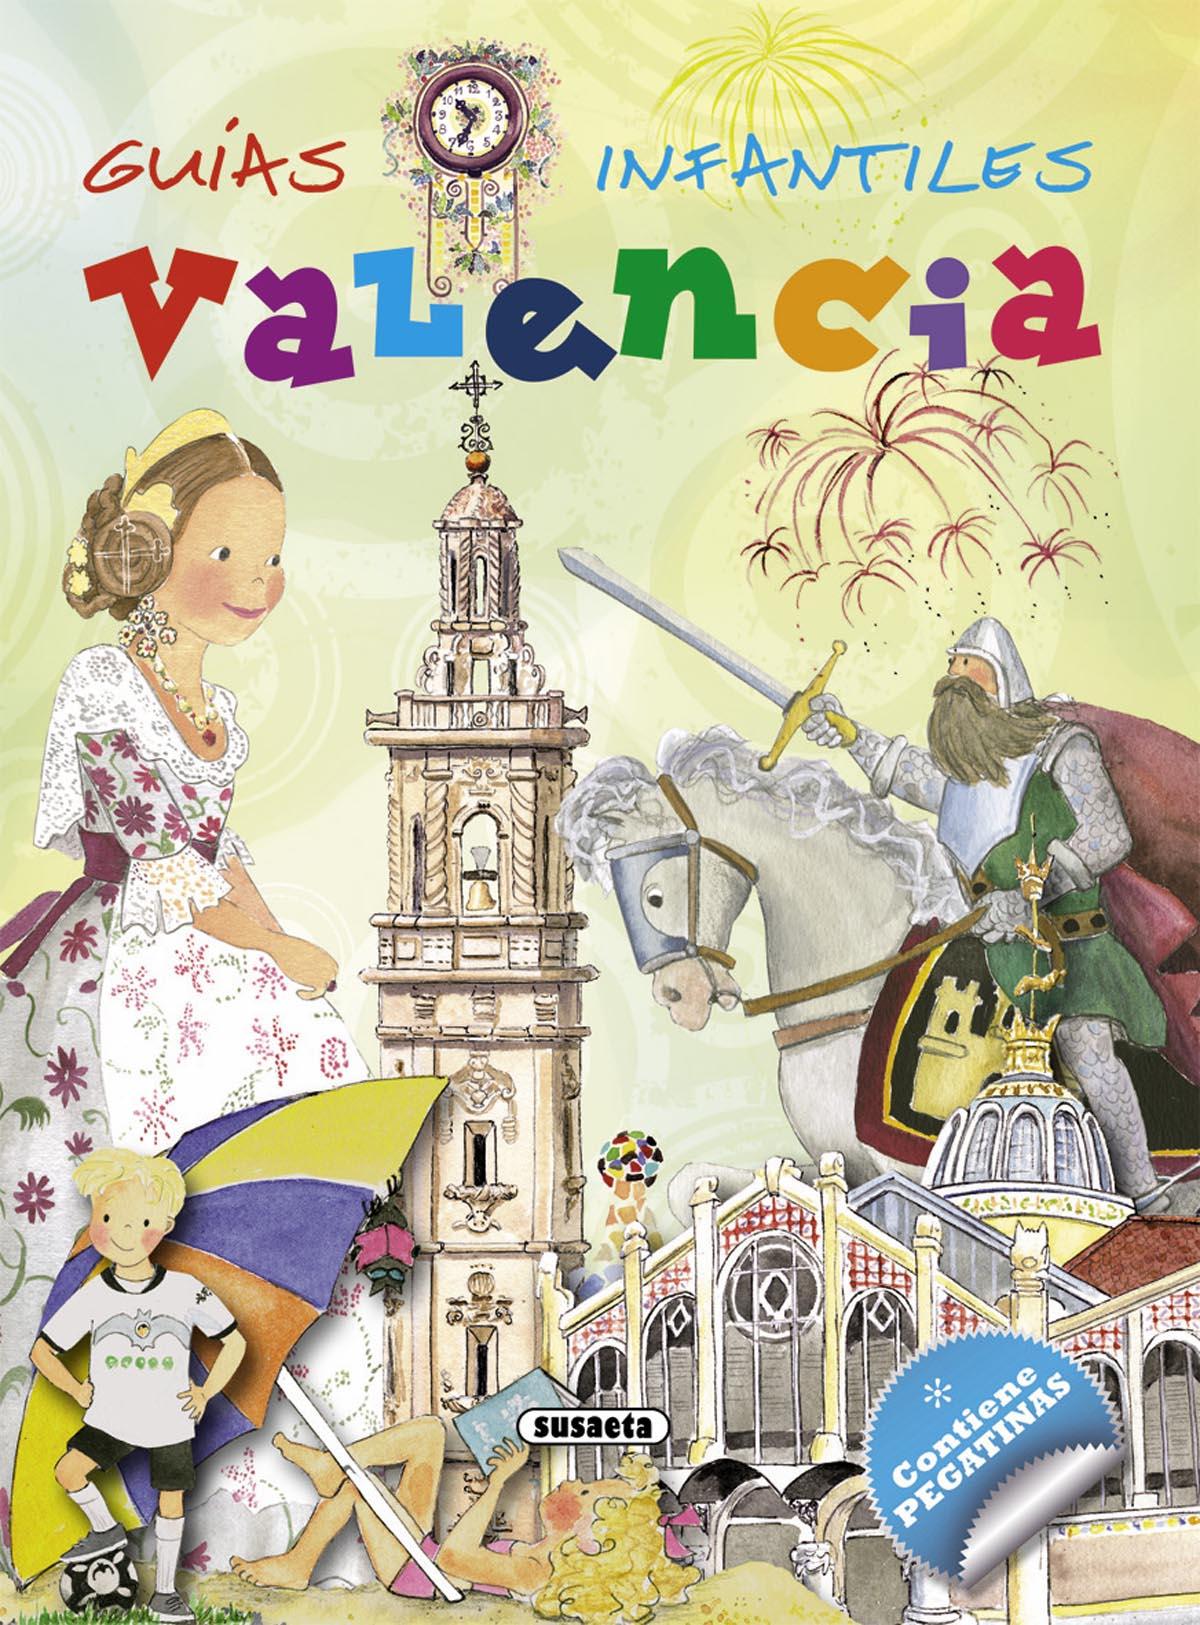 Infantiles valencia latest para fiestas infantiles en for Muebles shena valencia